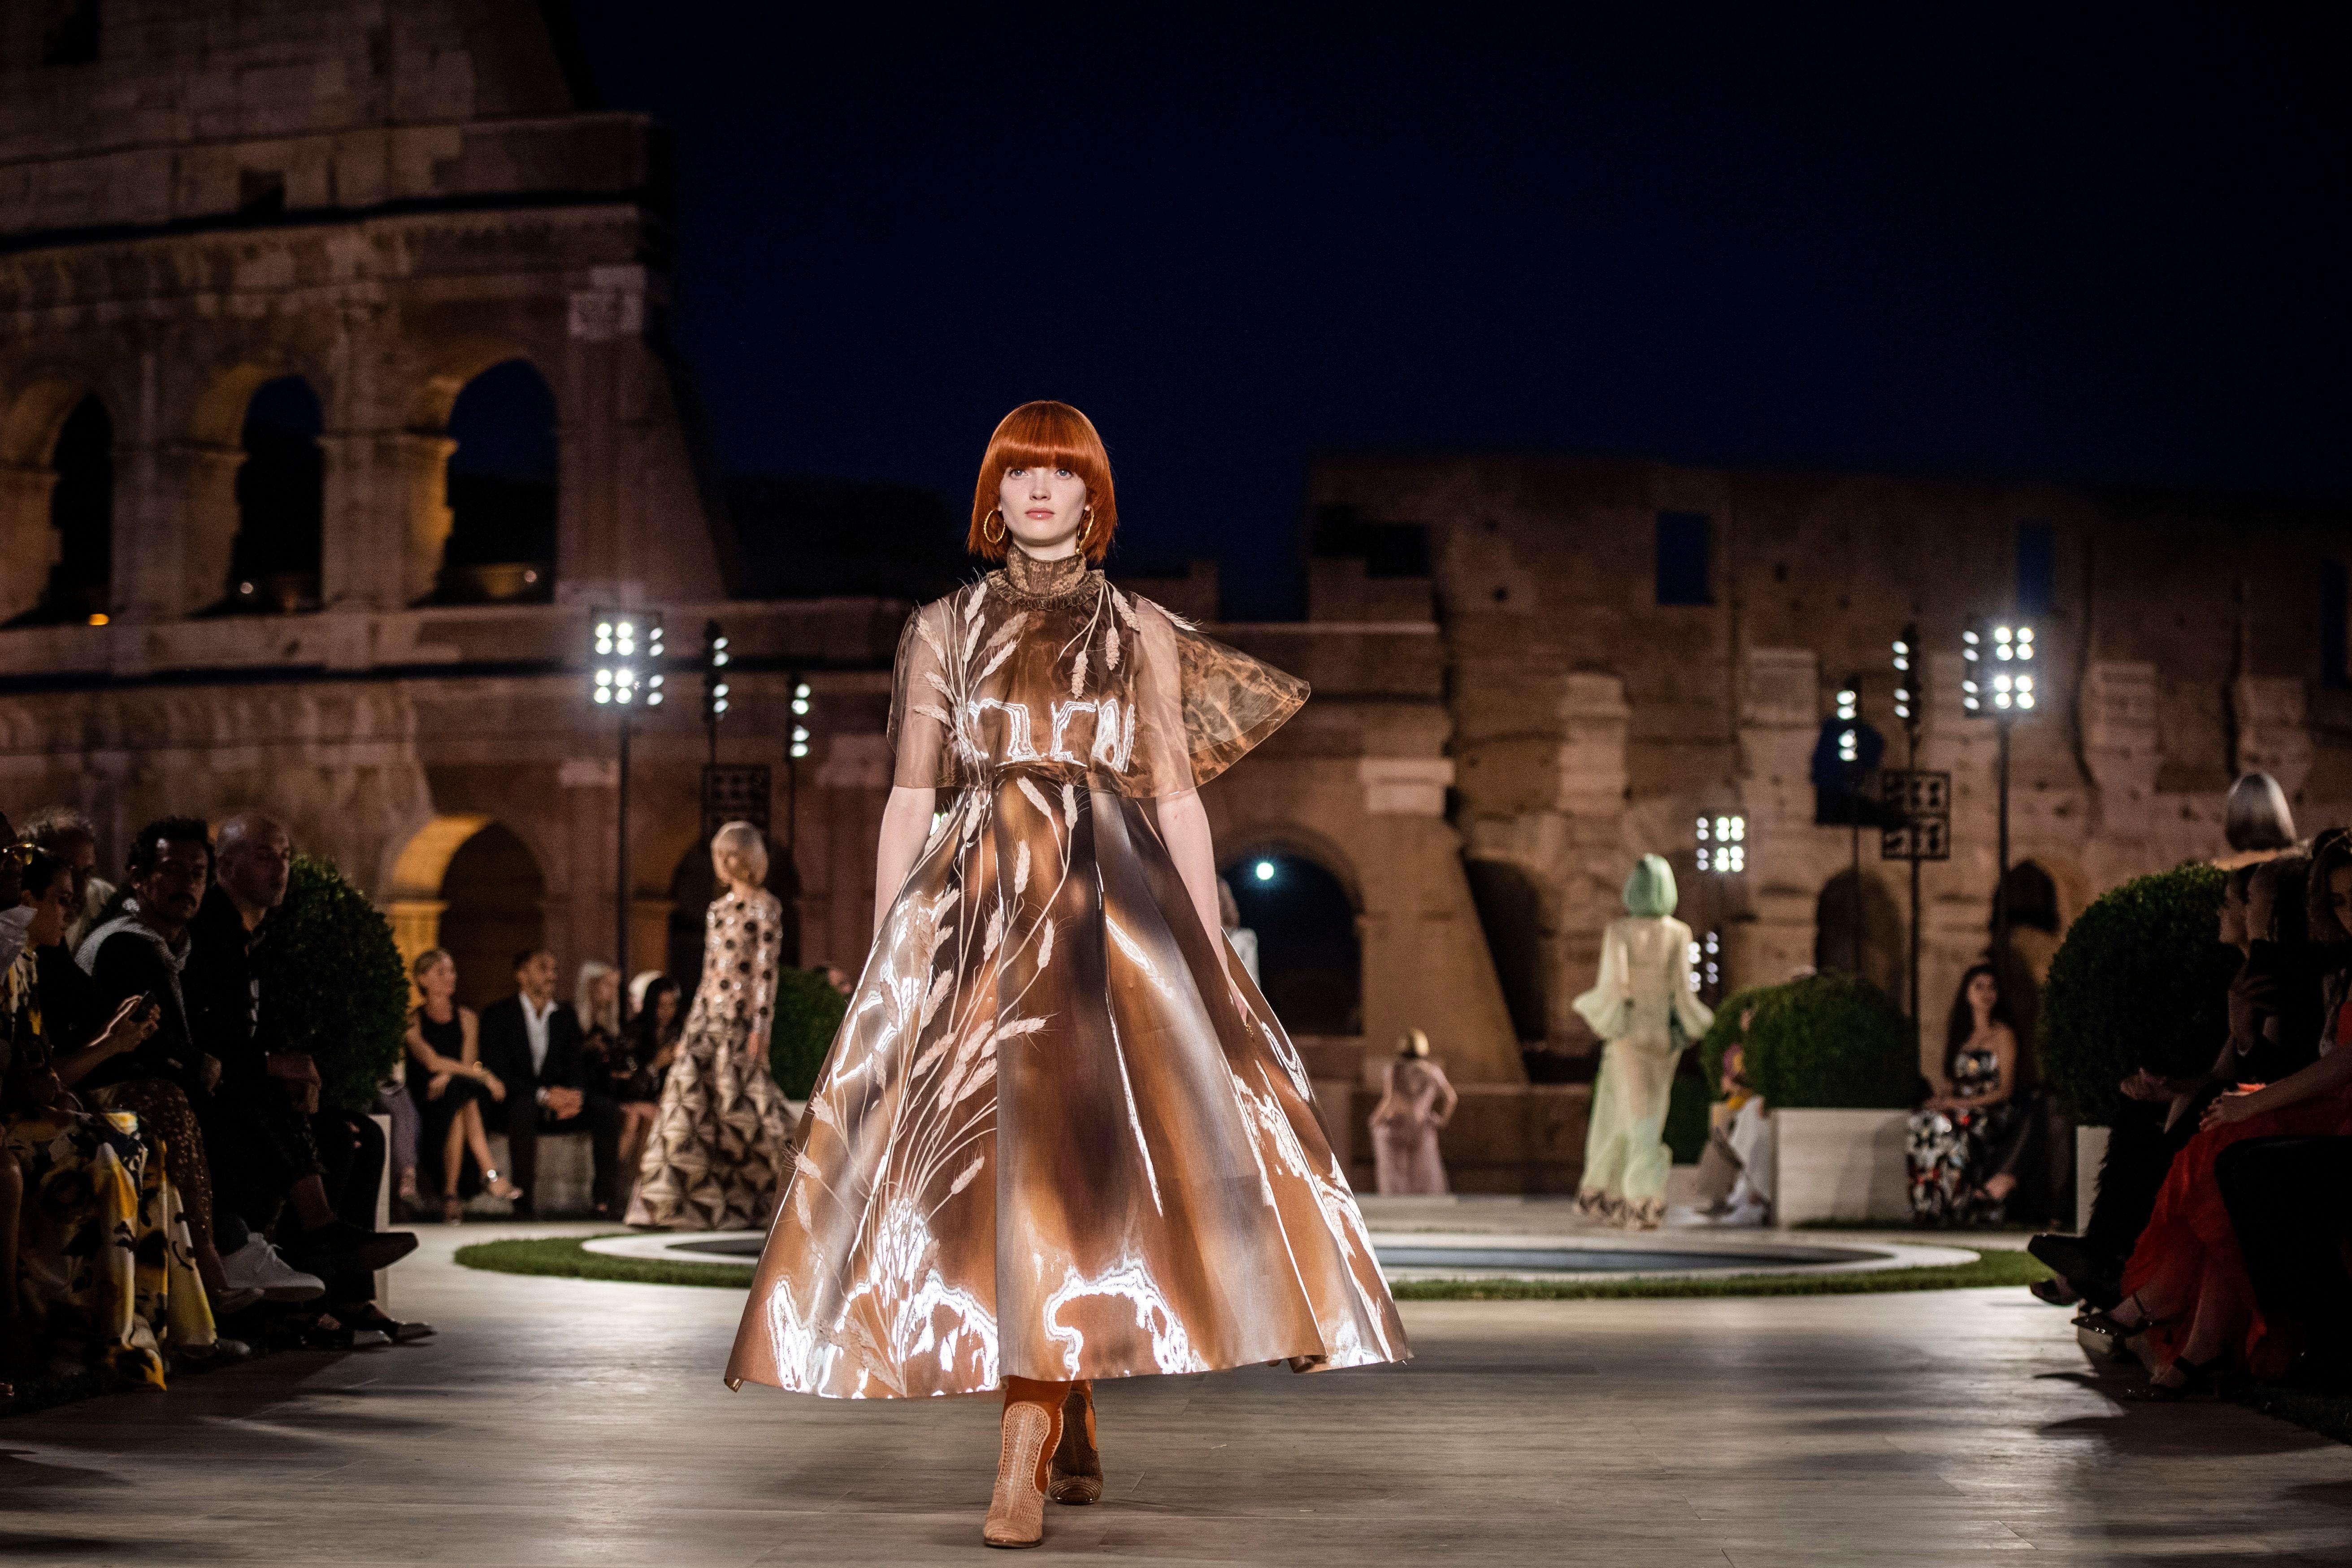 Model on the catwalkFendi show, Runway, Palatine Hill, Rome, Italy - 04 Jul 2019